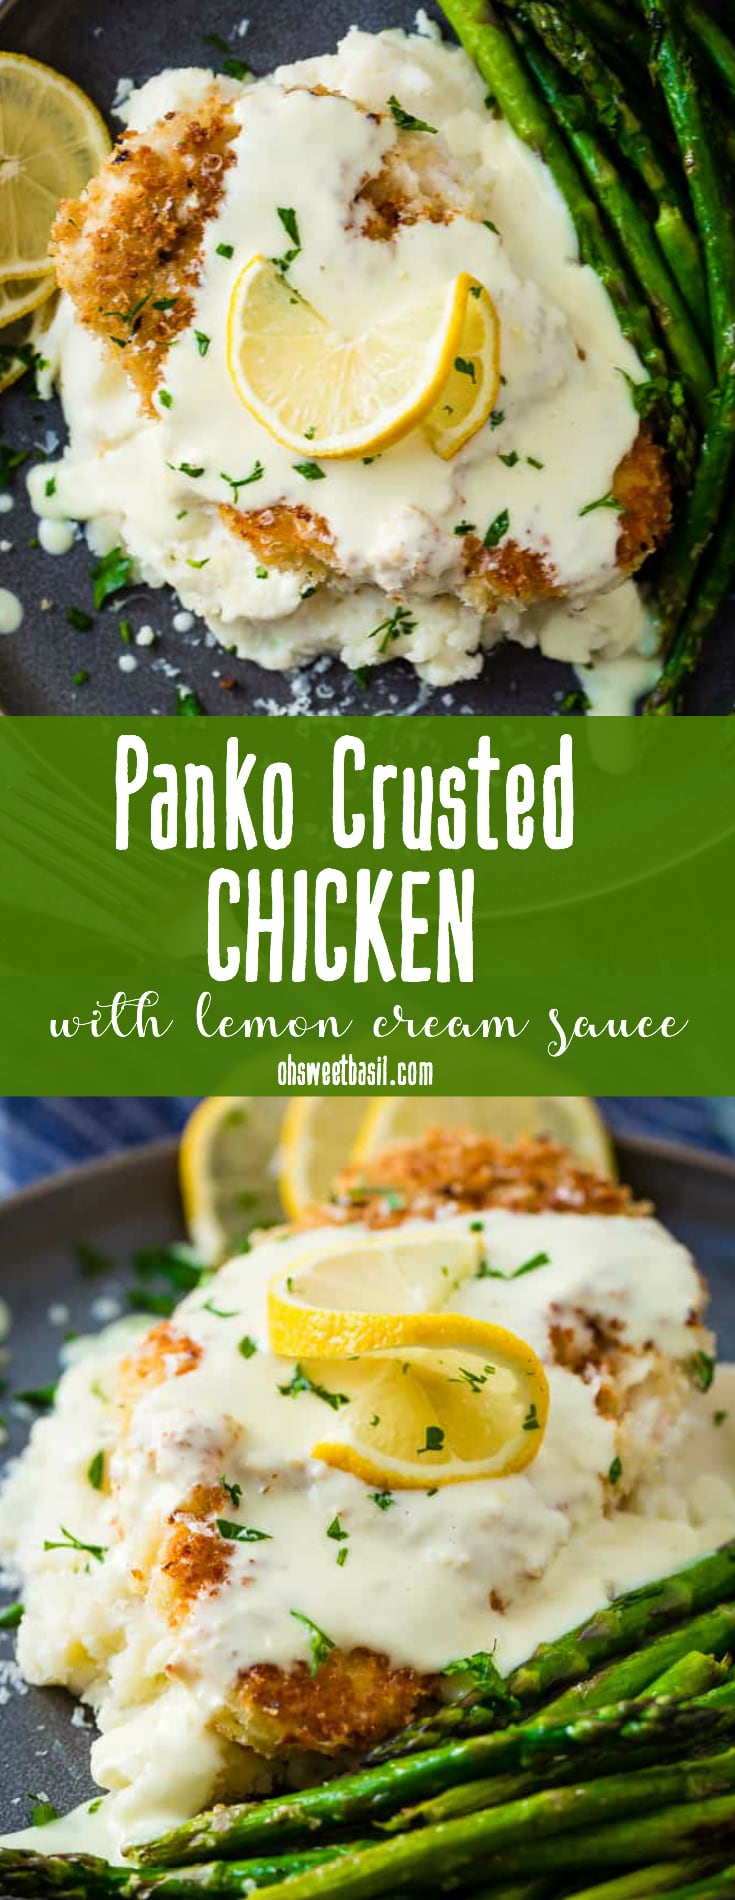 Panko Crusted Chicken with a Lemon Cream Sauce